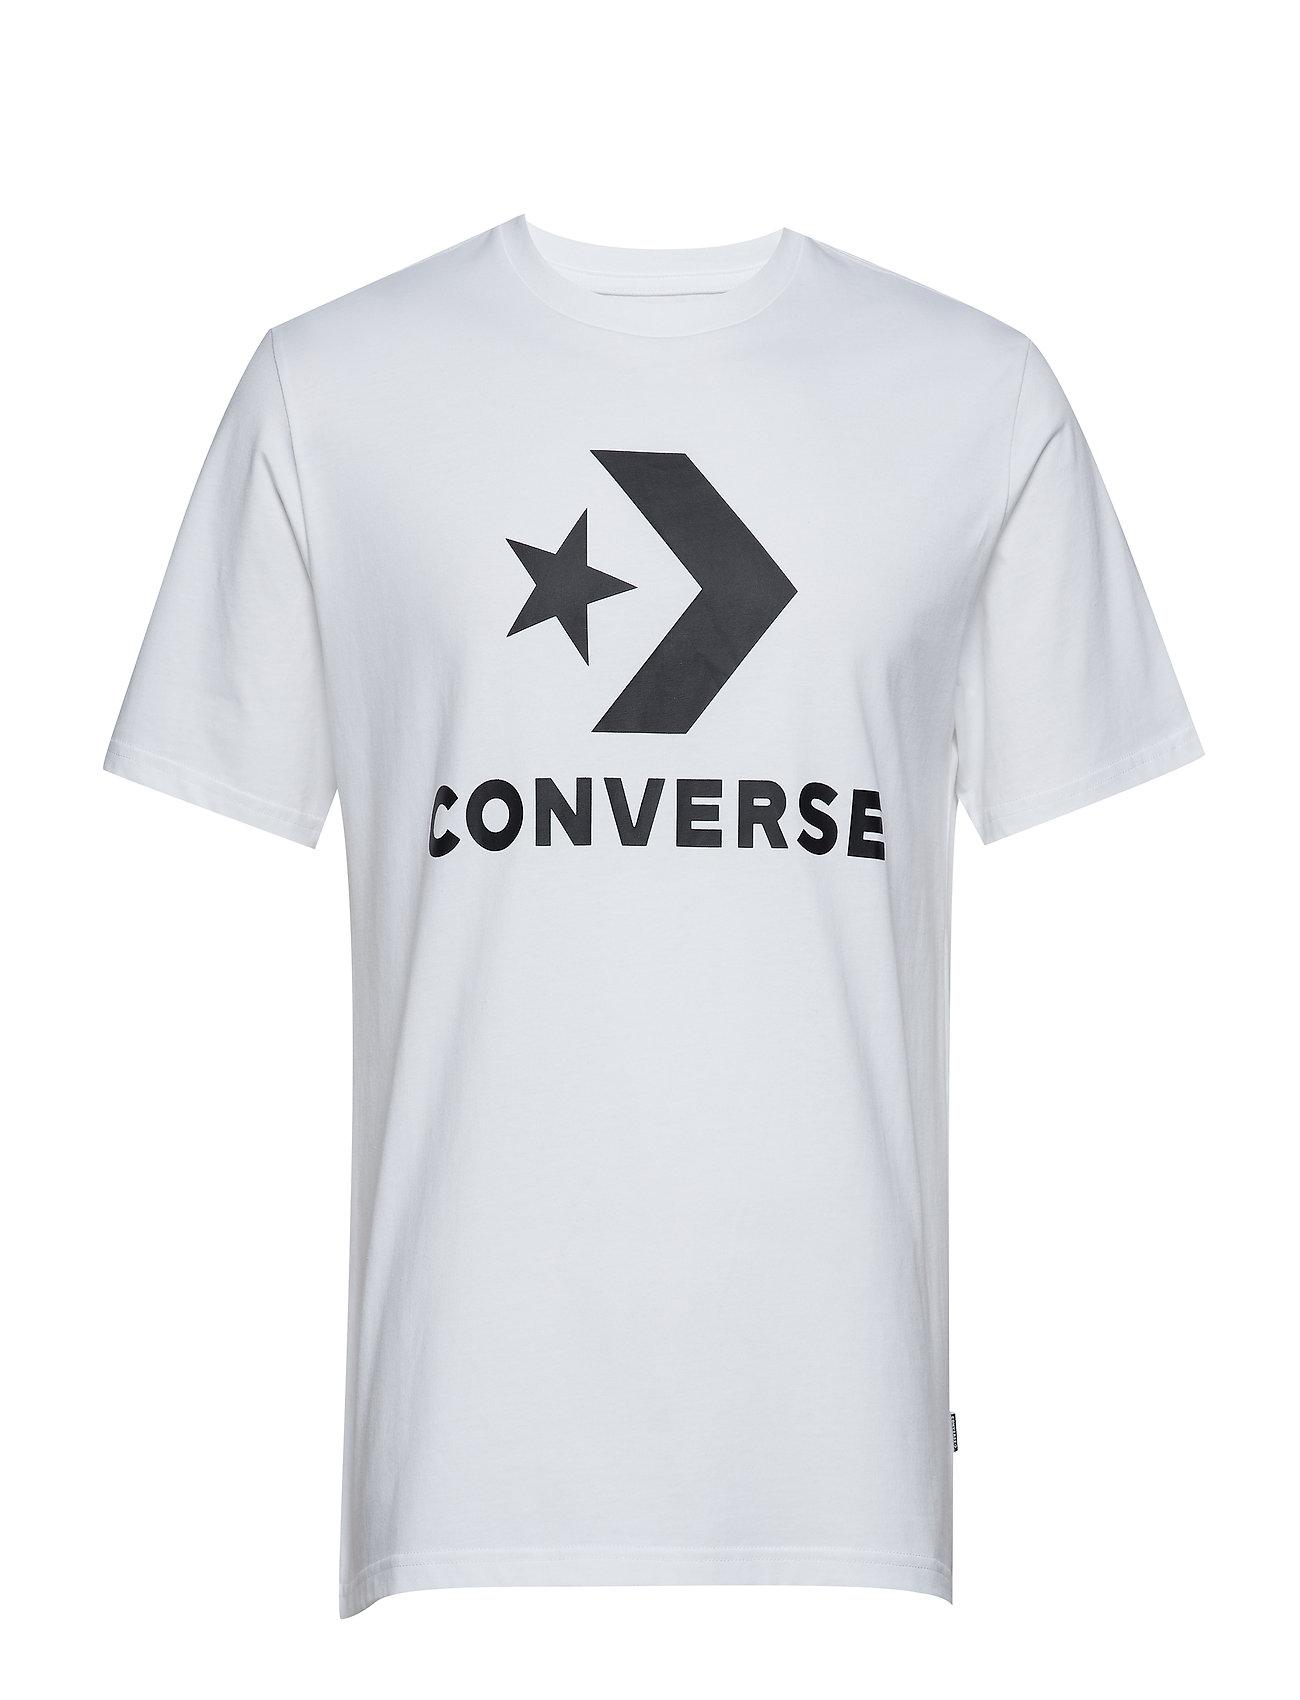 Converse Star Chevron Converse Star Chevron Converse Star Teewhite Teewhite mNn0v8w